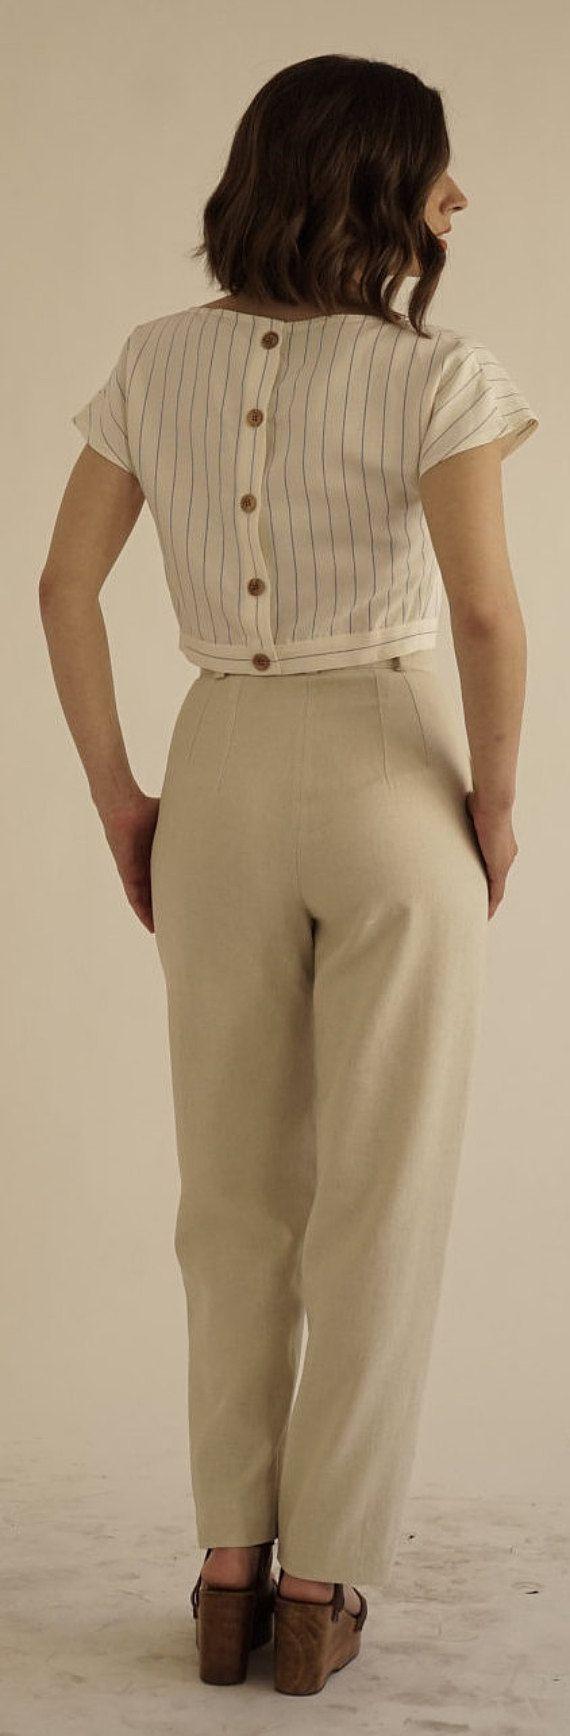 High waisted linen trousers.